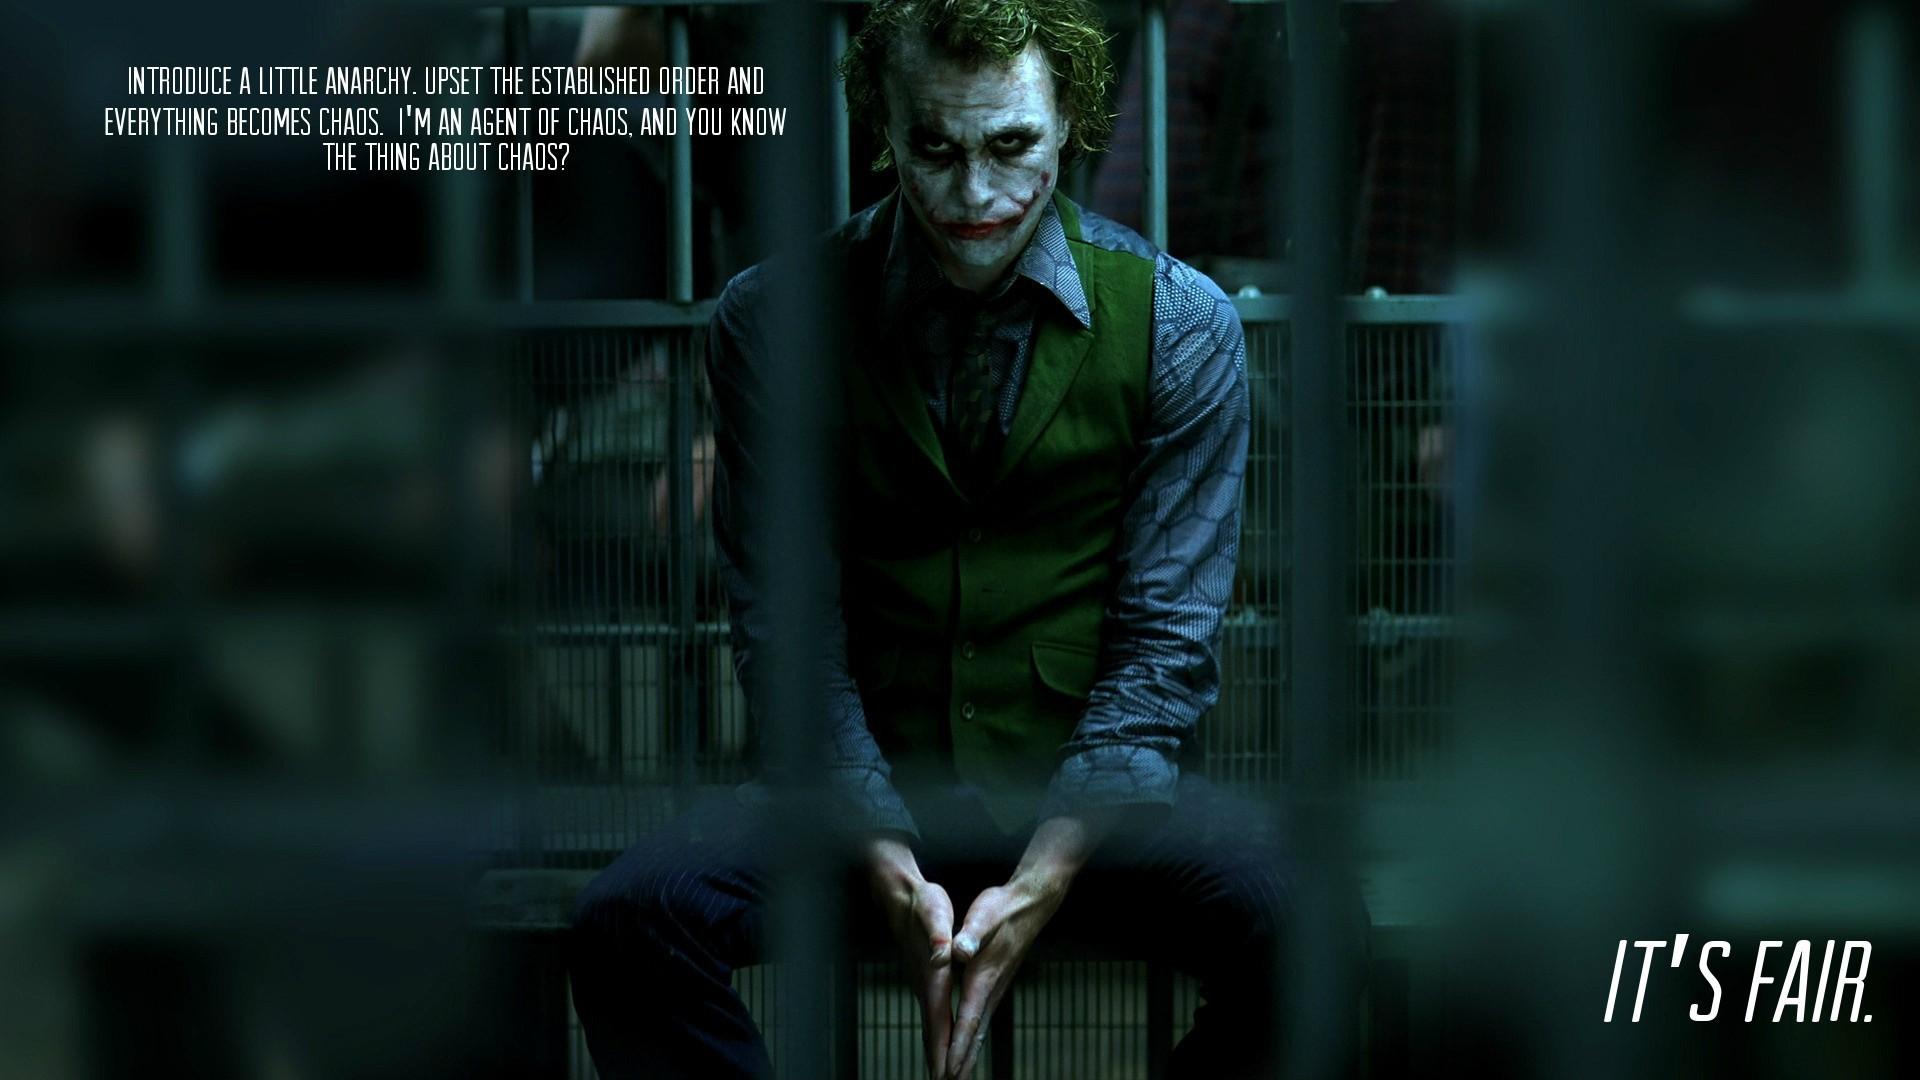 Batman Dc Comics Heath Ledger Jail Quotes The Dark Knight Joker